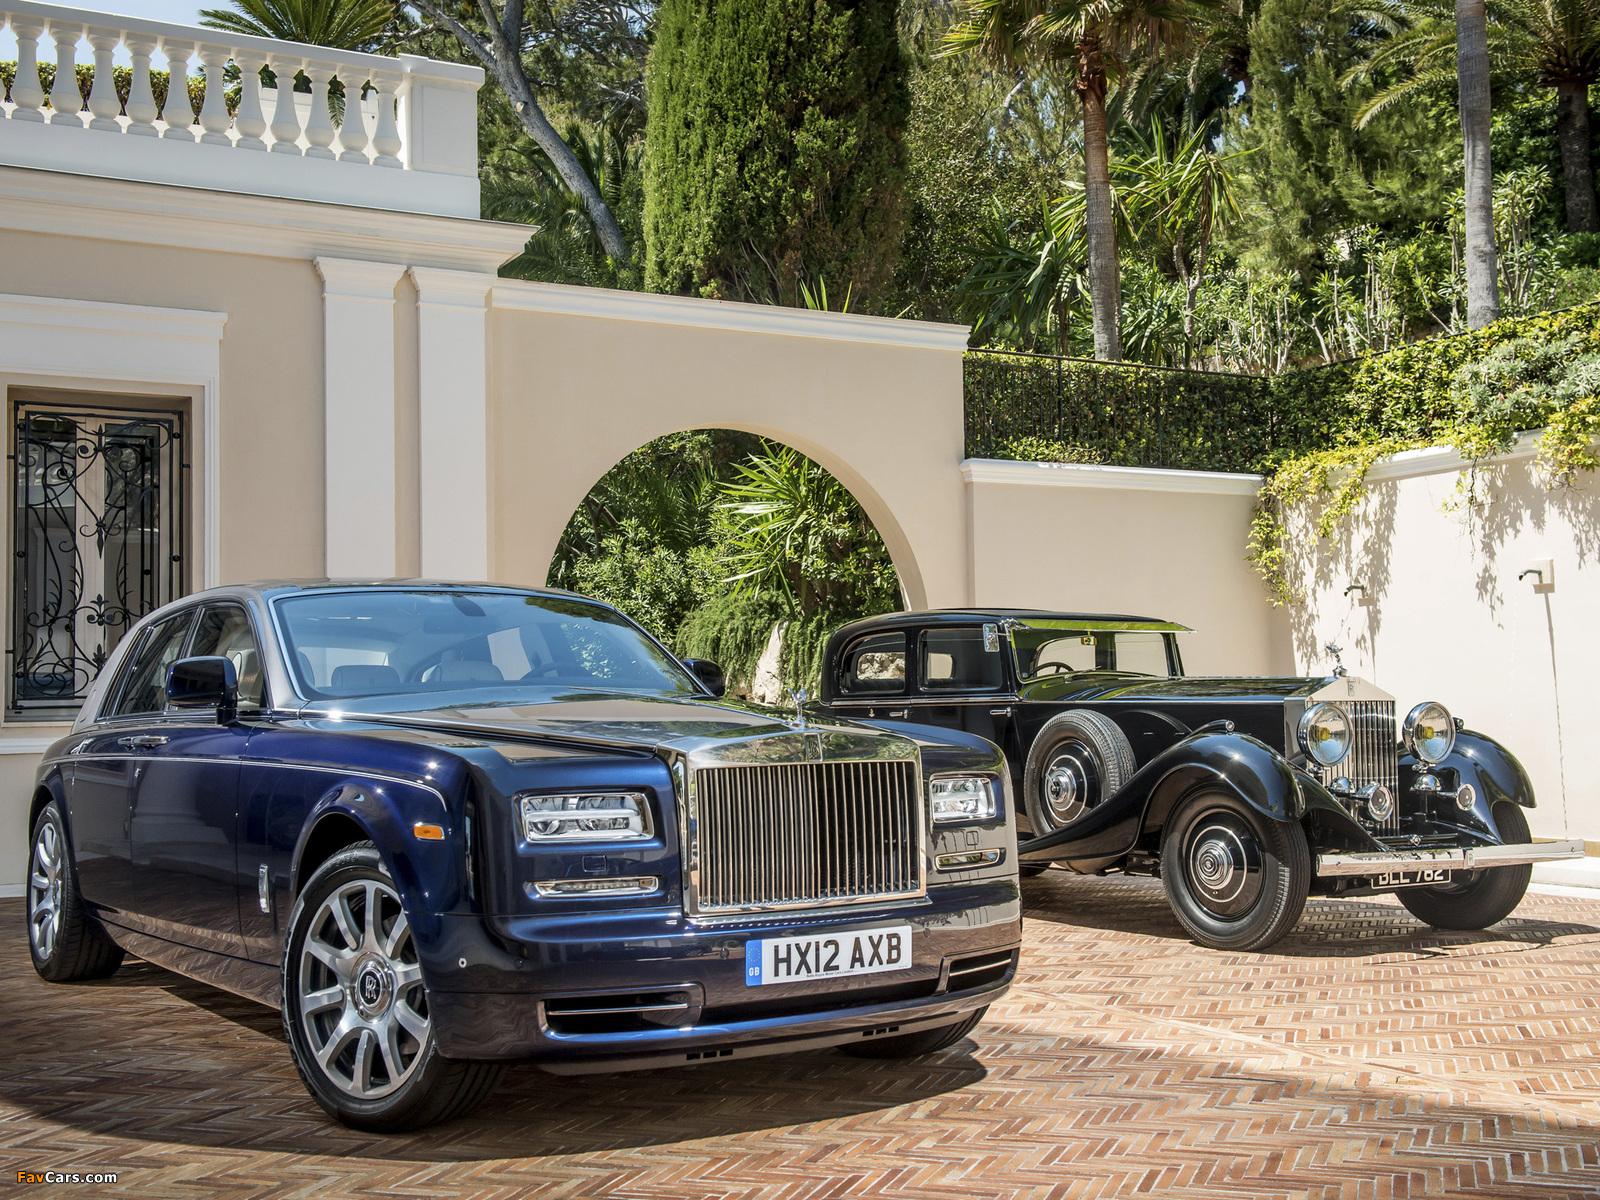 Rolls-Royce wallpapers (1600 x 1200)